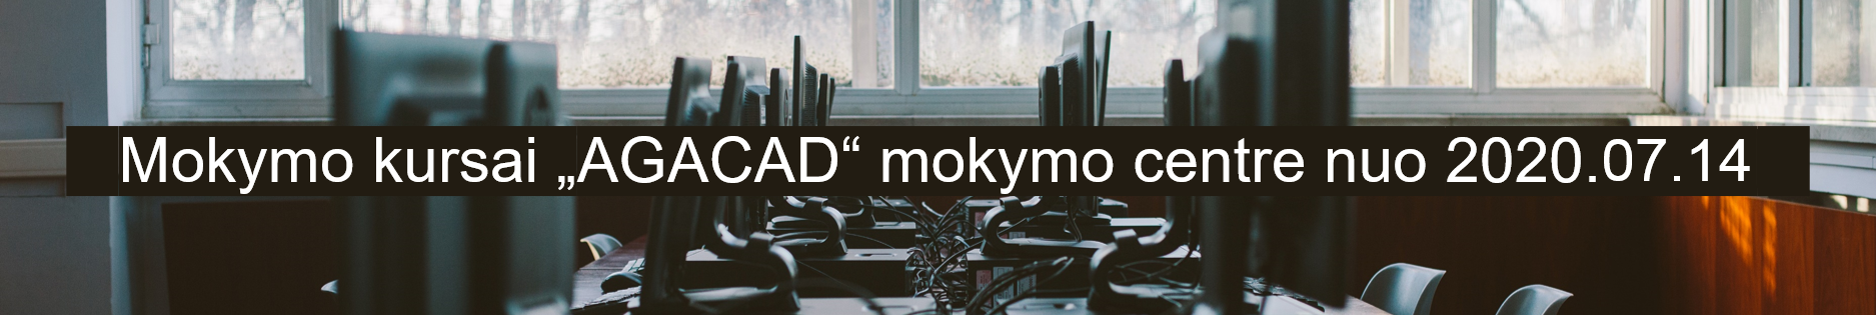 BIM, Revit, Civil 3D, Dynamo mokymai AGACAD